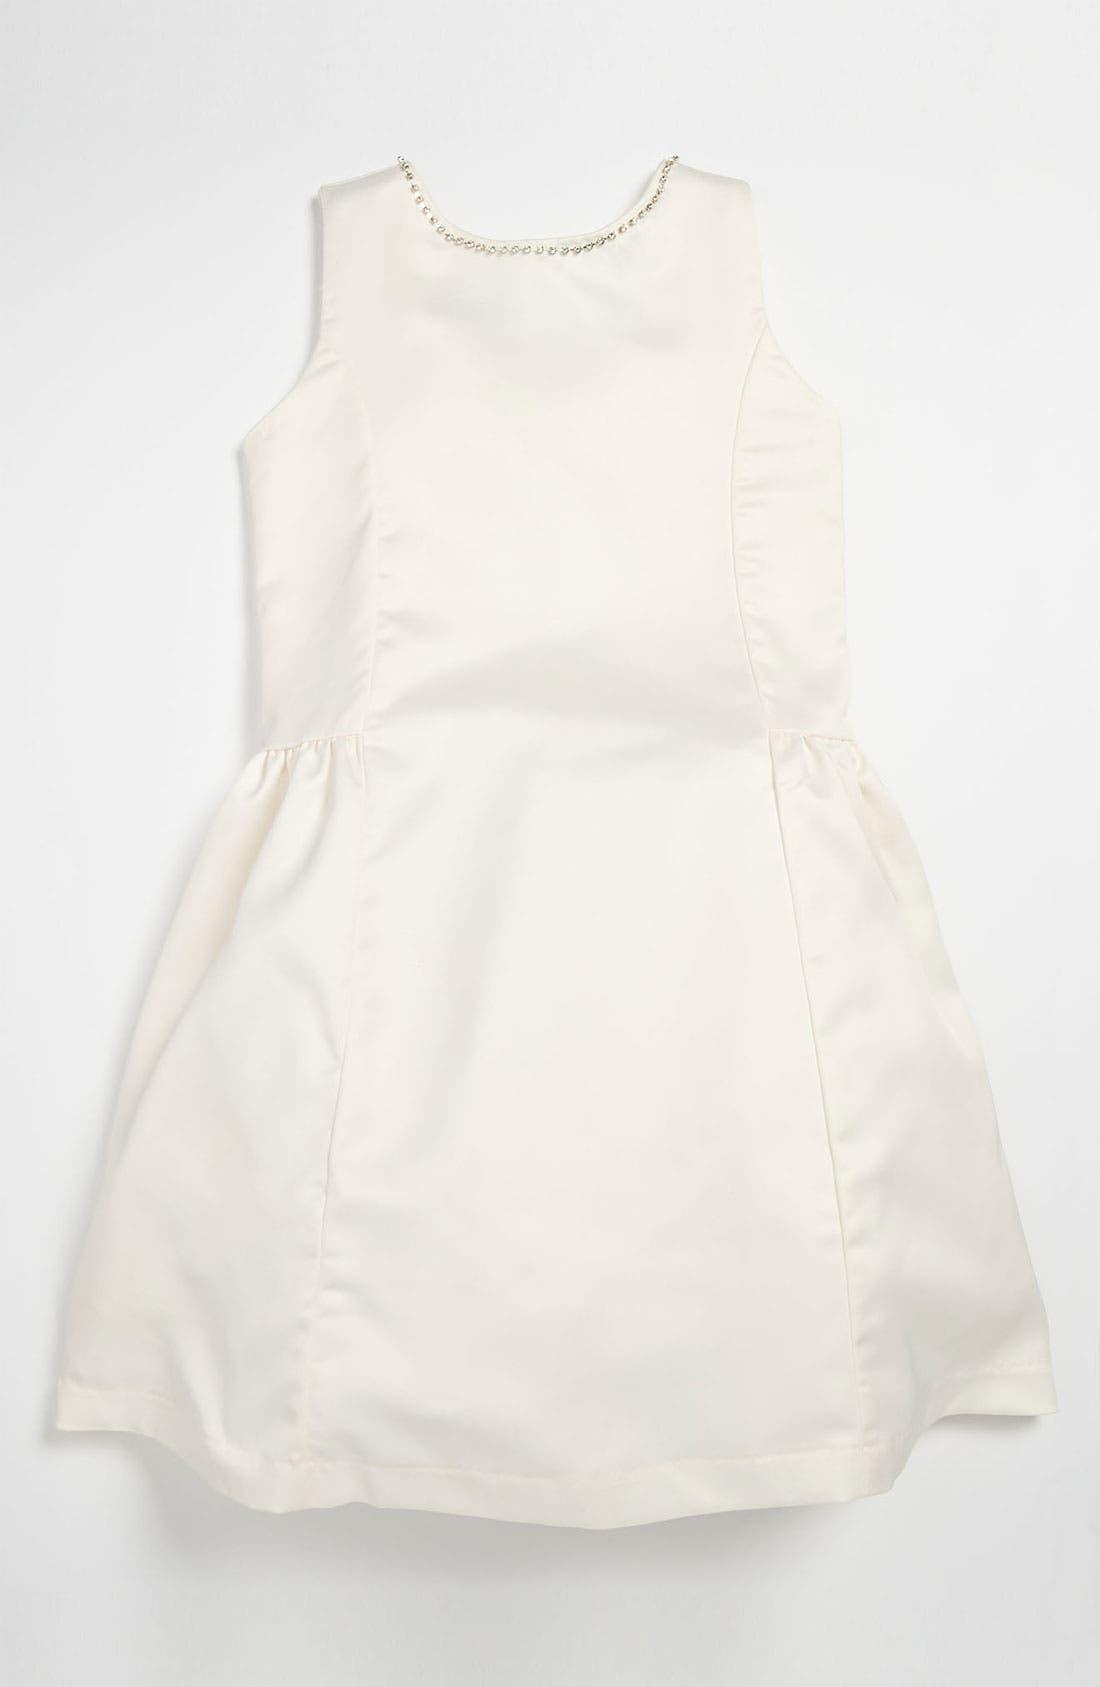 Alternate Image 1 Selected - La Piccola Danza Kidswear Bow Back Dress (Little Girls & Big Girls)